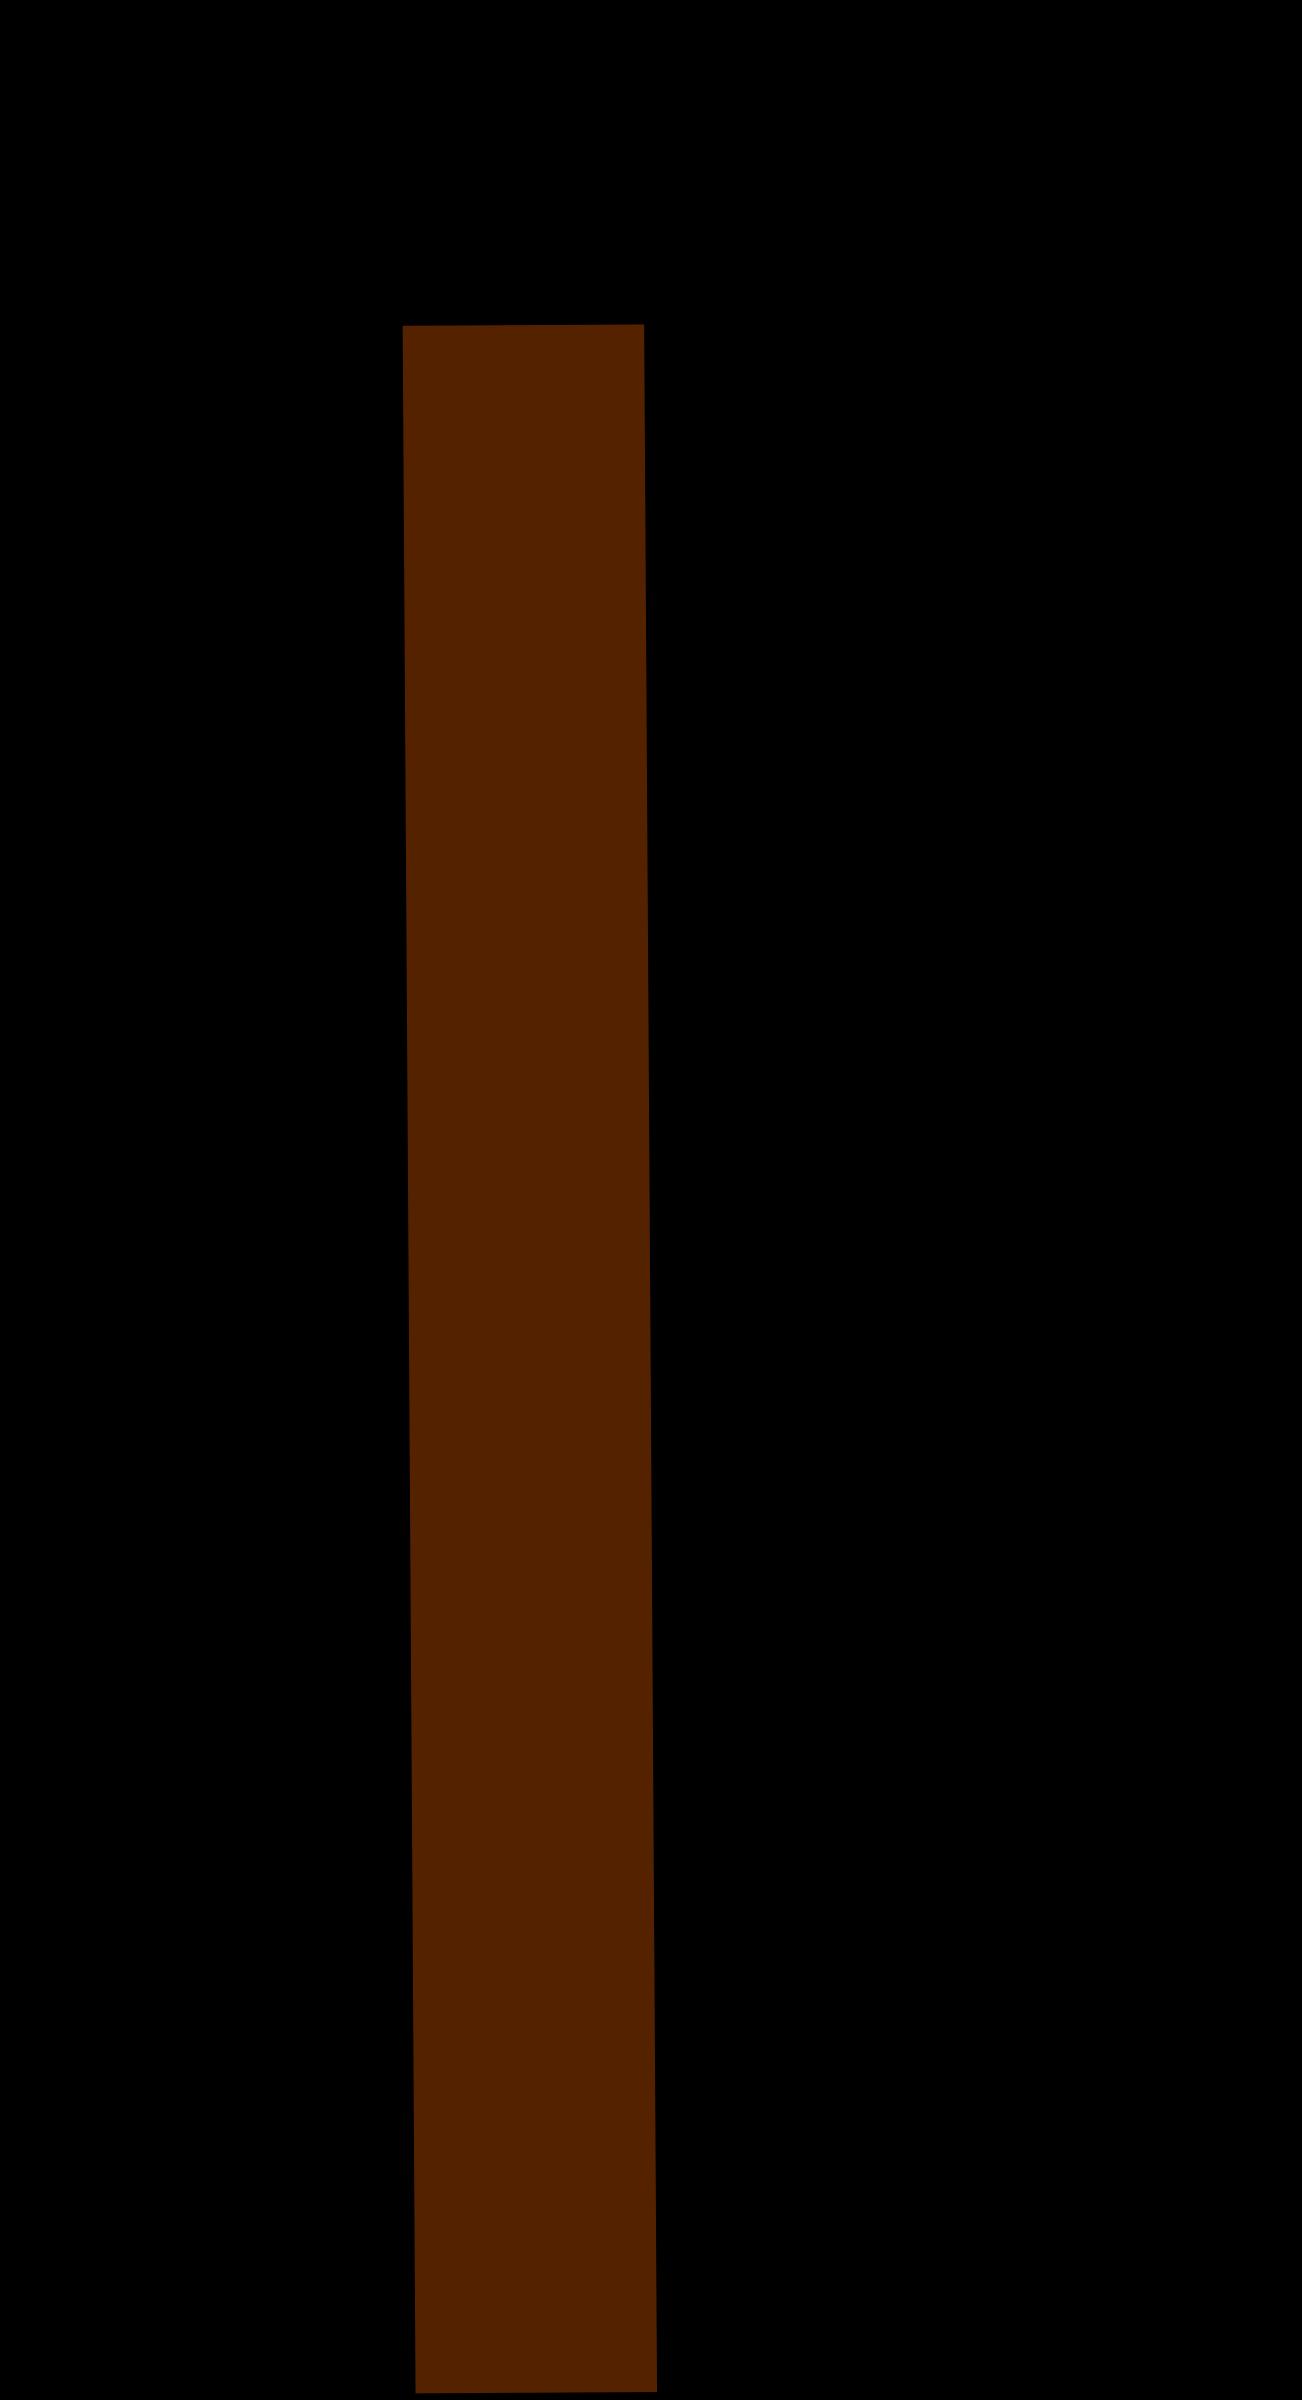 Clipart hammer hammer wood. Big image png